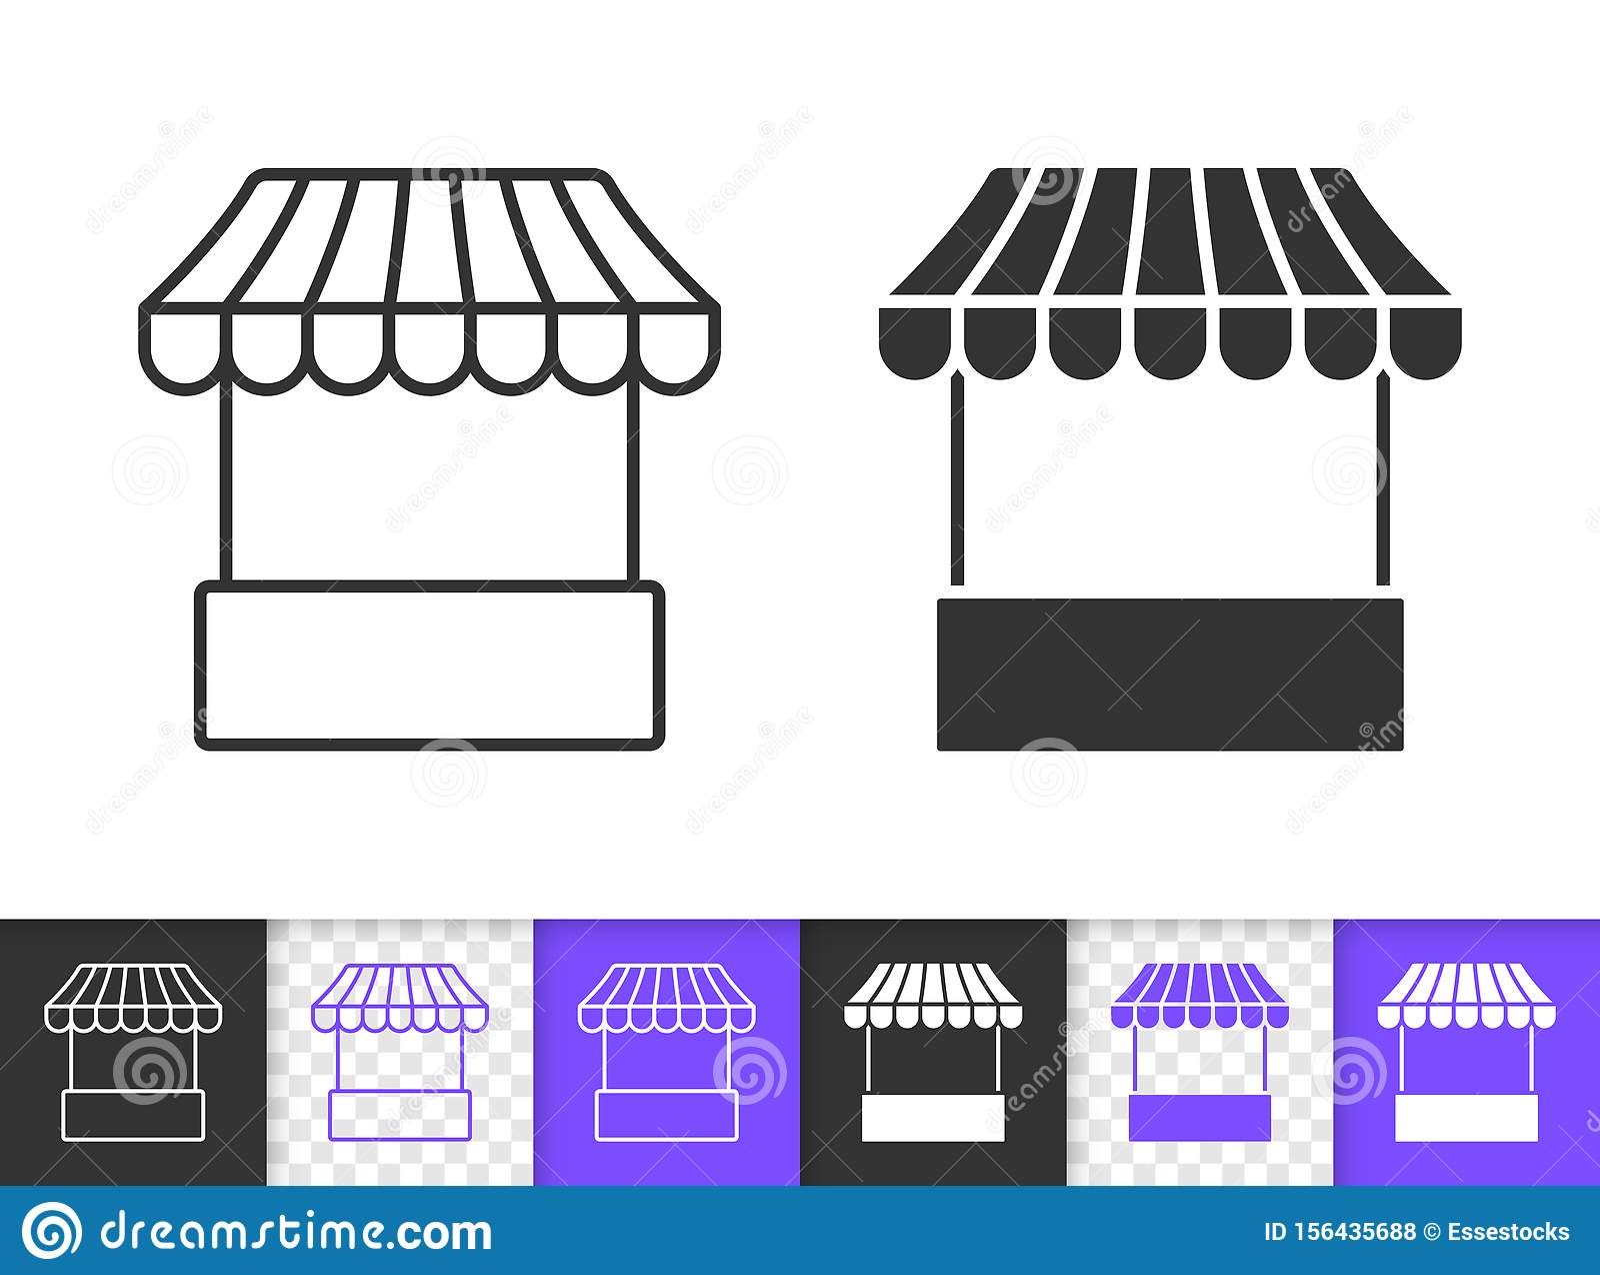 Vendors In A Street Market In Thailand Stock Vector - Illustration of  illustration, city: 182265519